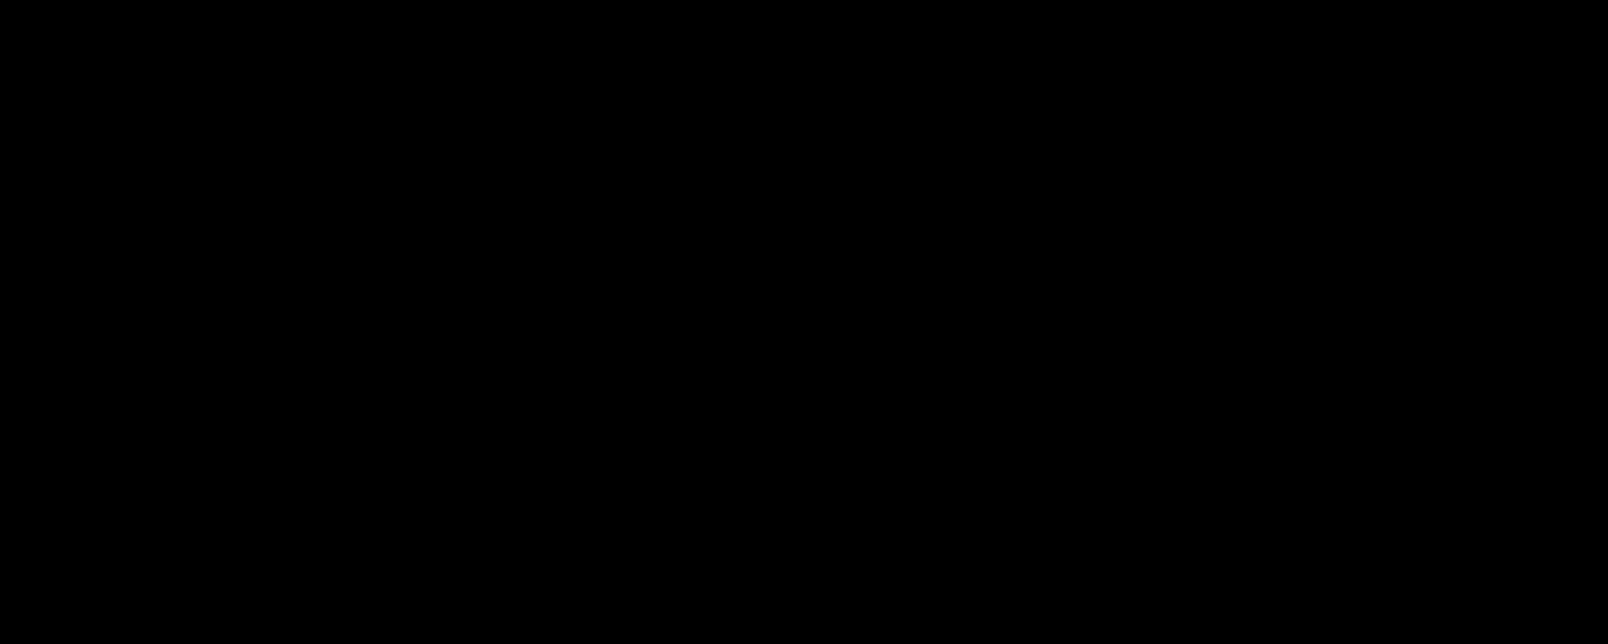 Risperidone Carboxylate Impurity